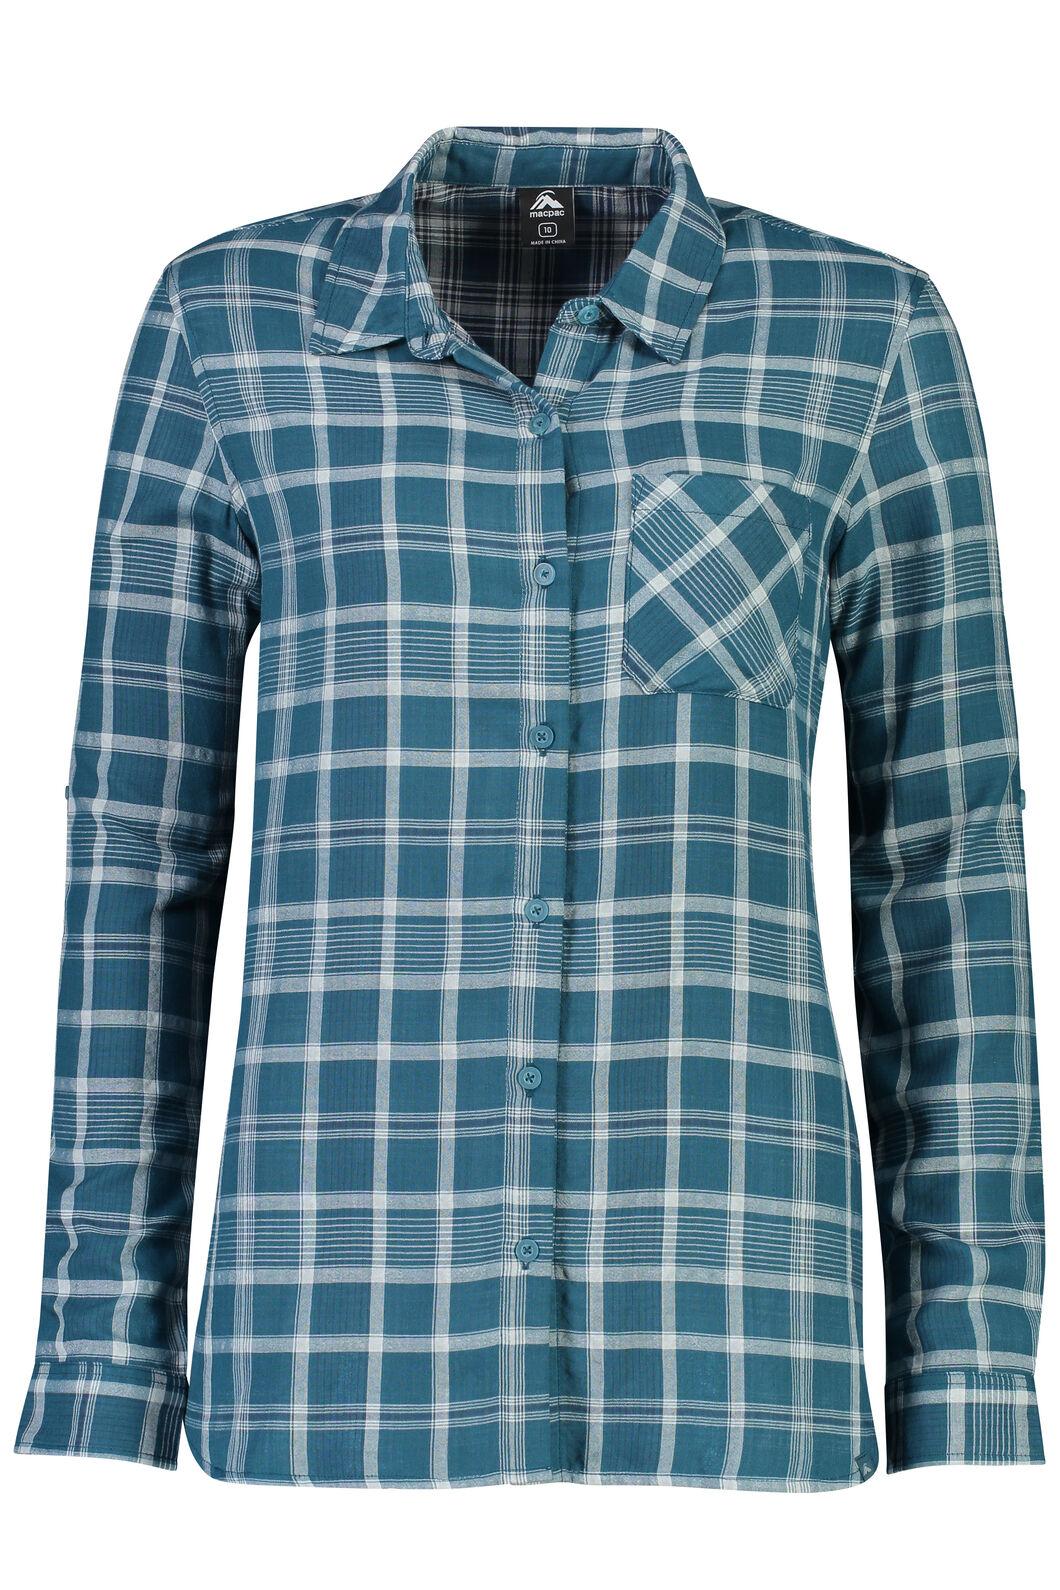 Macpac Olivine Shirt - Women's, Blue Coral, hi-res